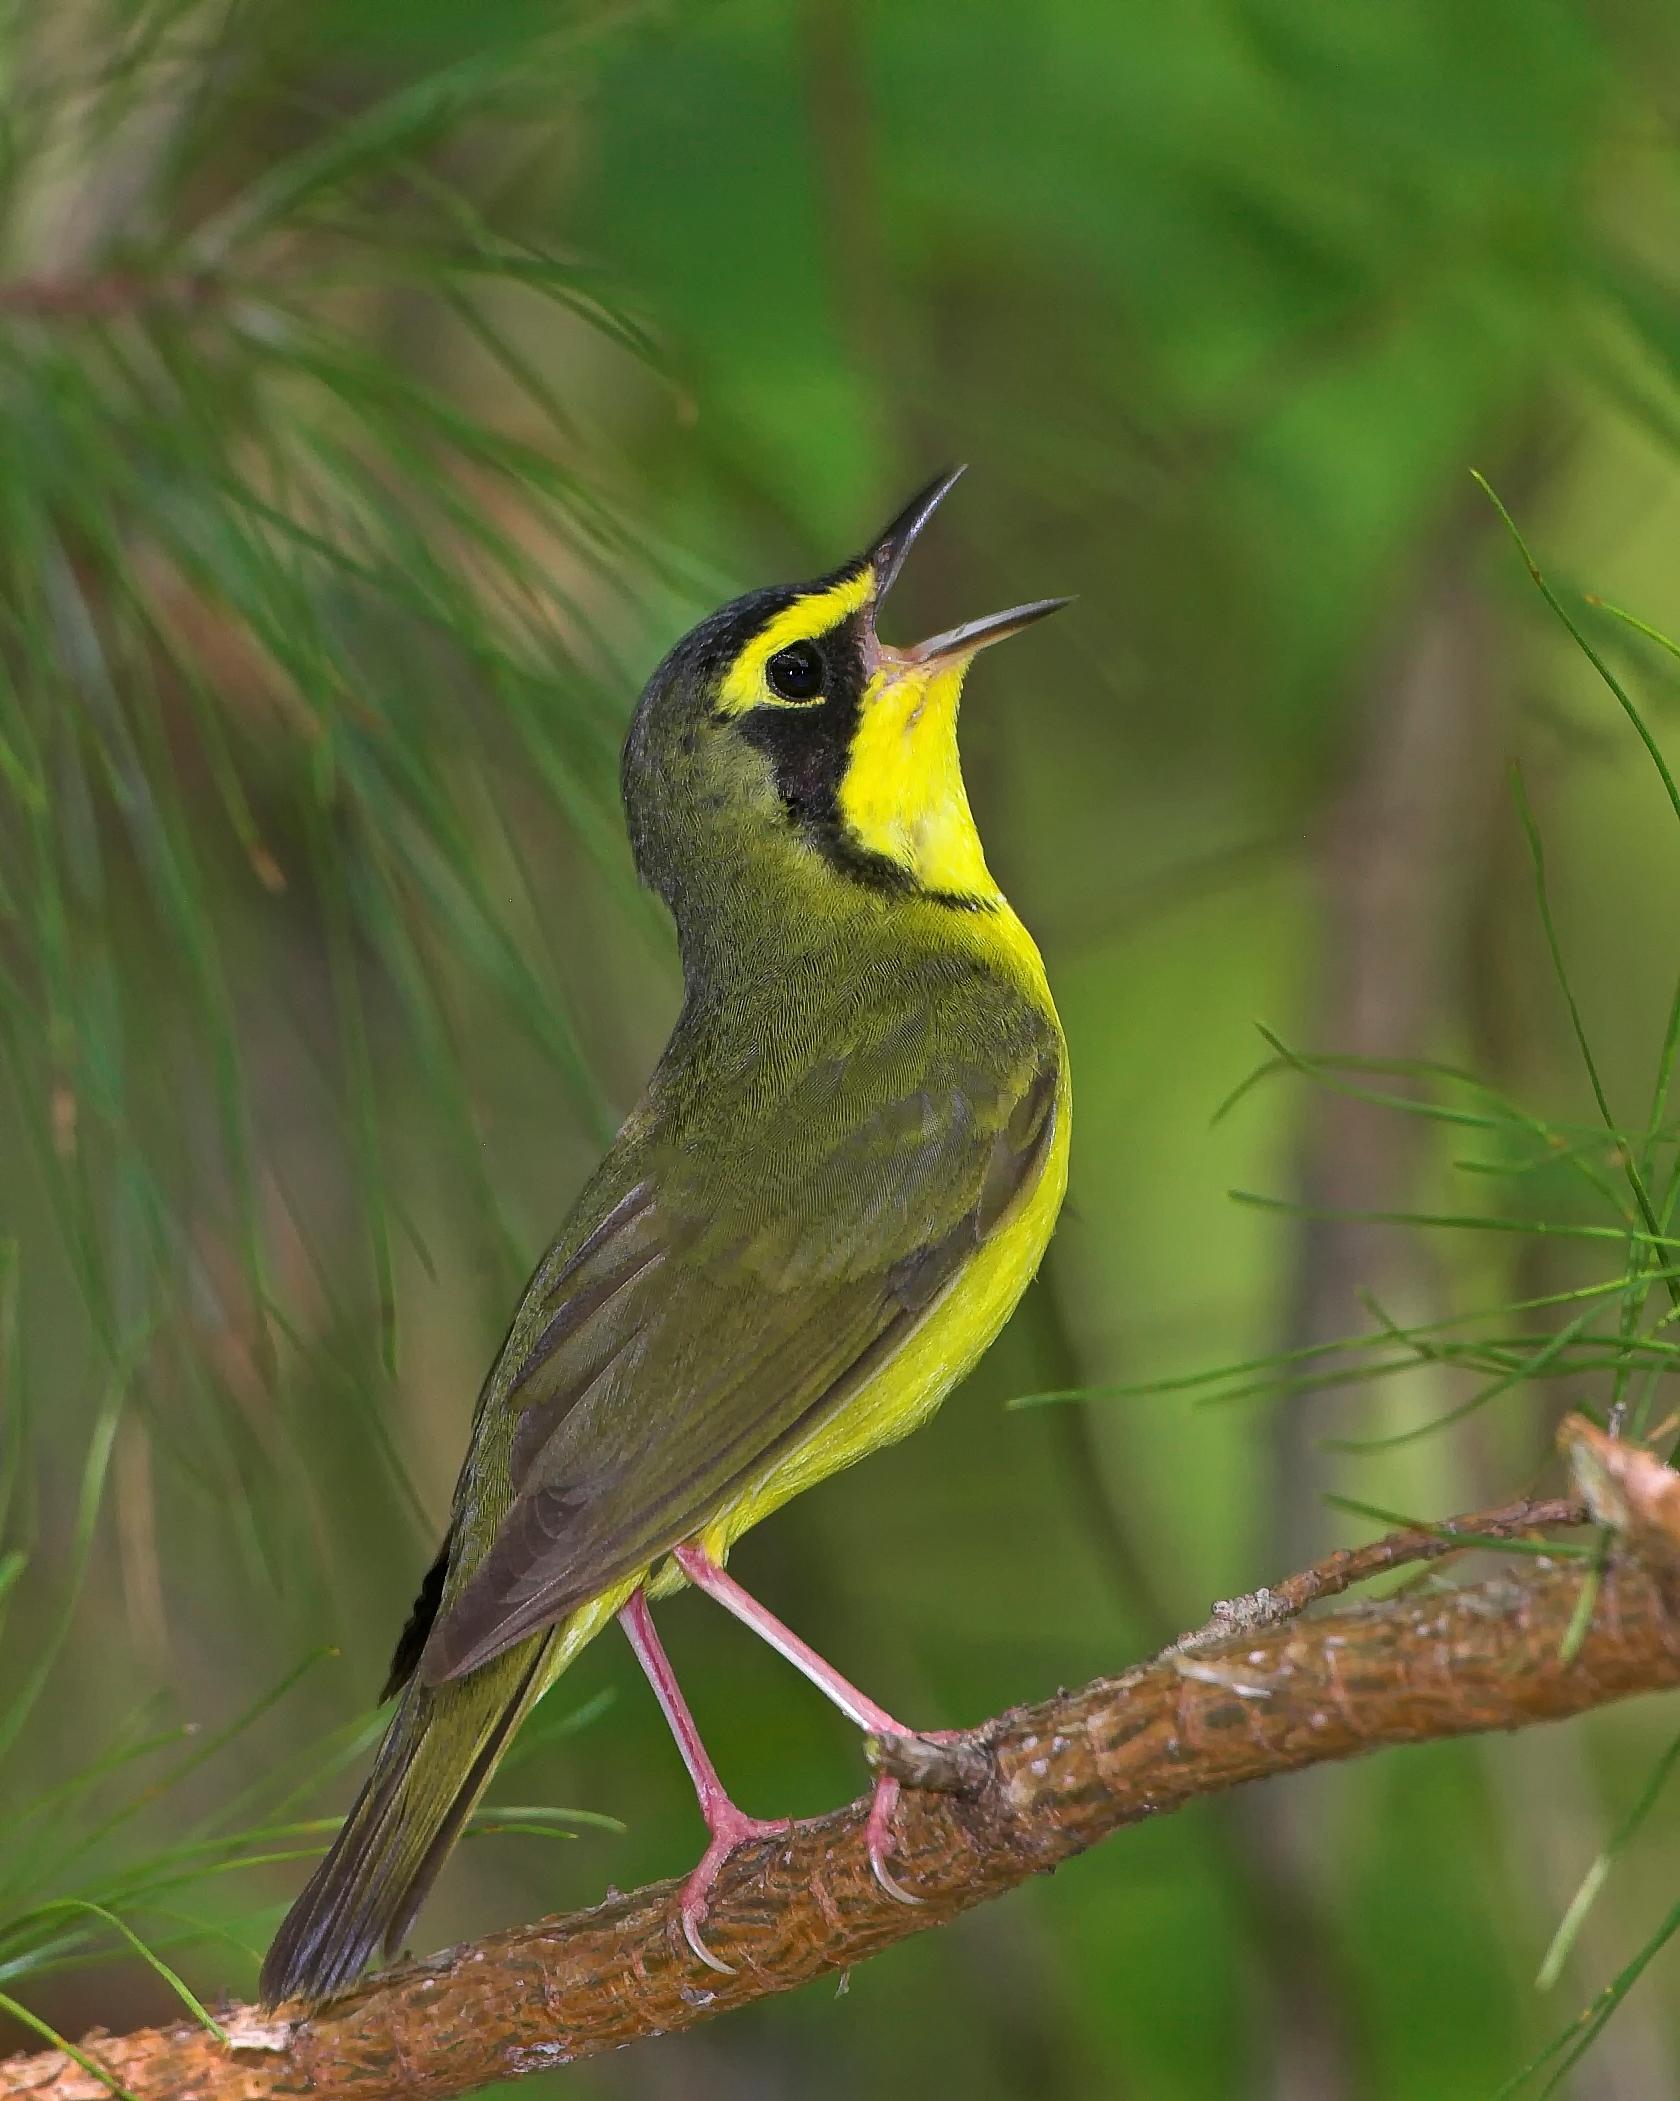 KentuckyWarbler(male)singing_06 (2).jpg